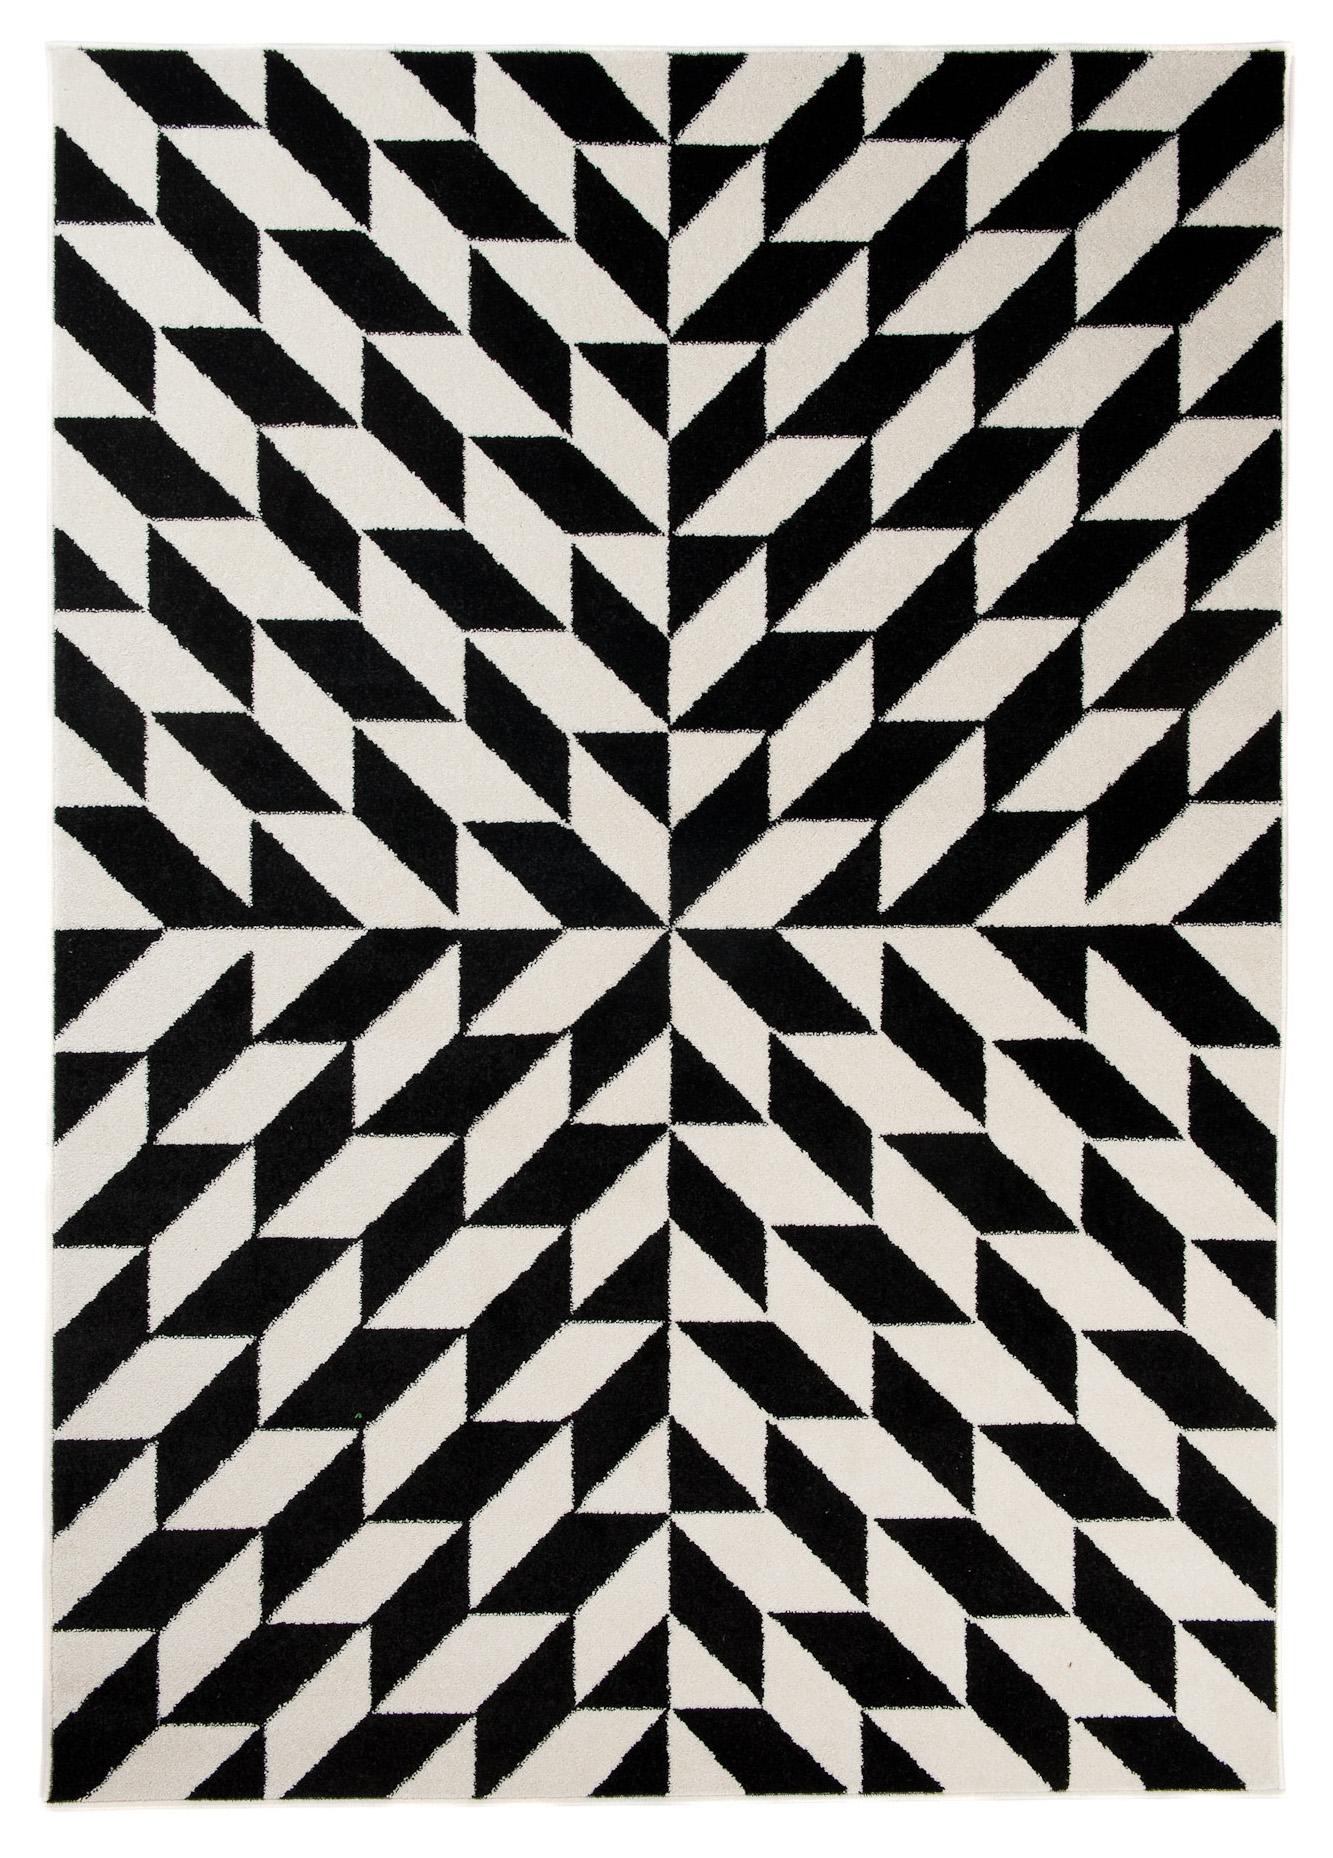 tapiso teppiche geometrische muster viereck 3d karo. Black Bedroom Furniture Sets. Home Design Ideas